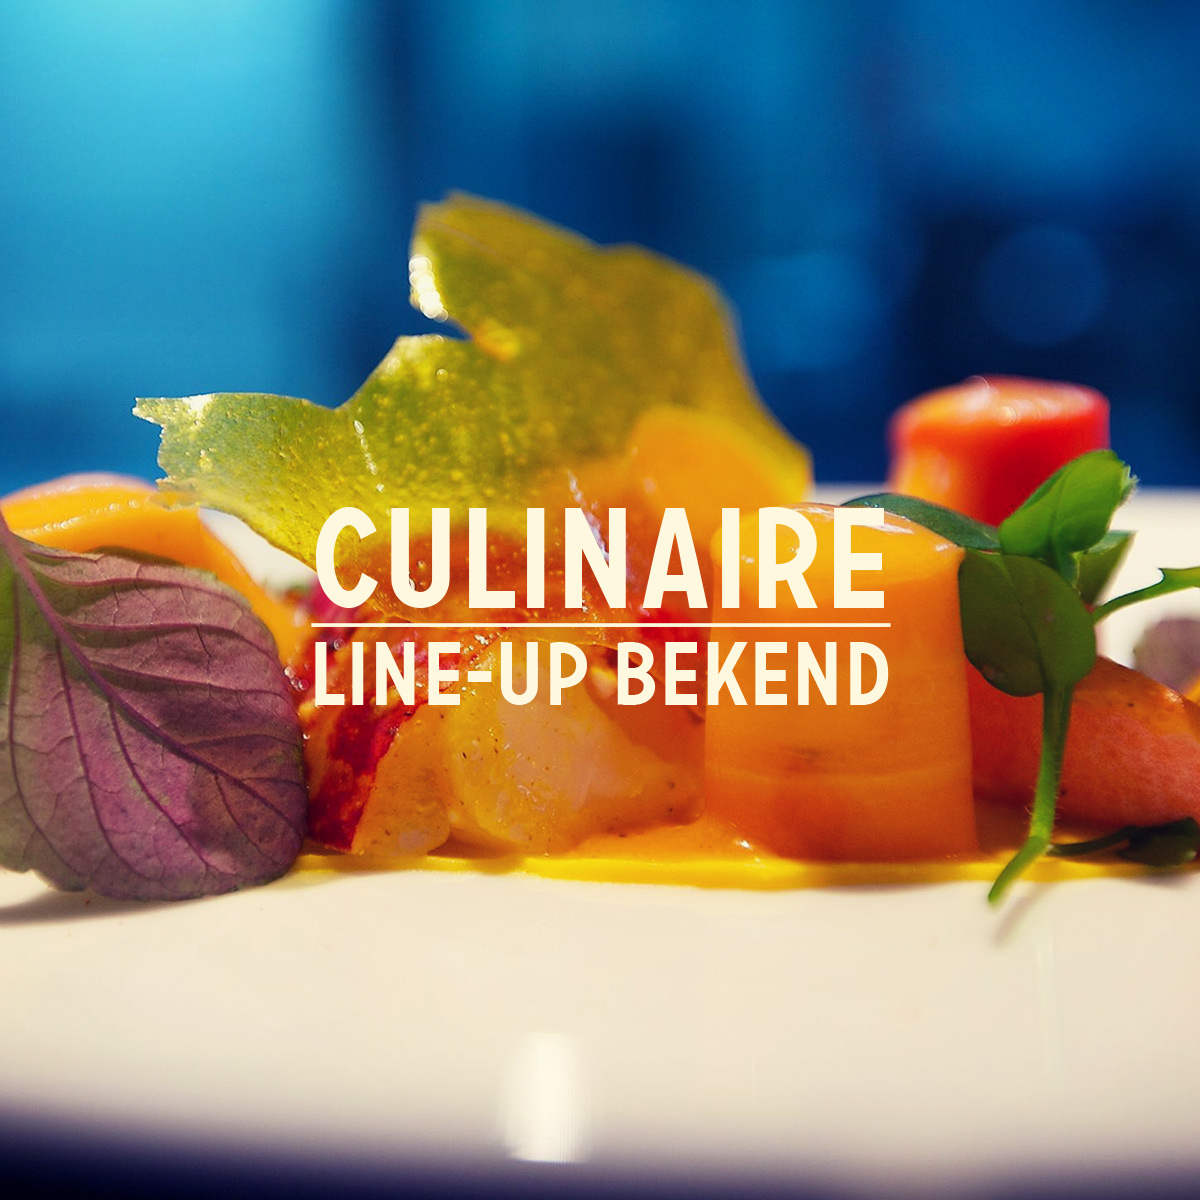 Culinaire programma bekend